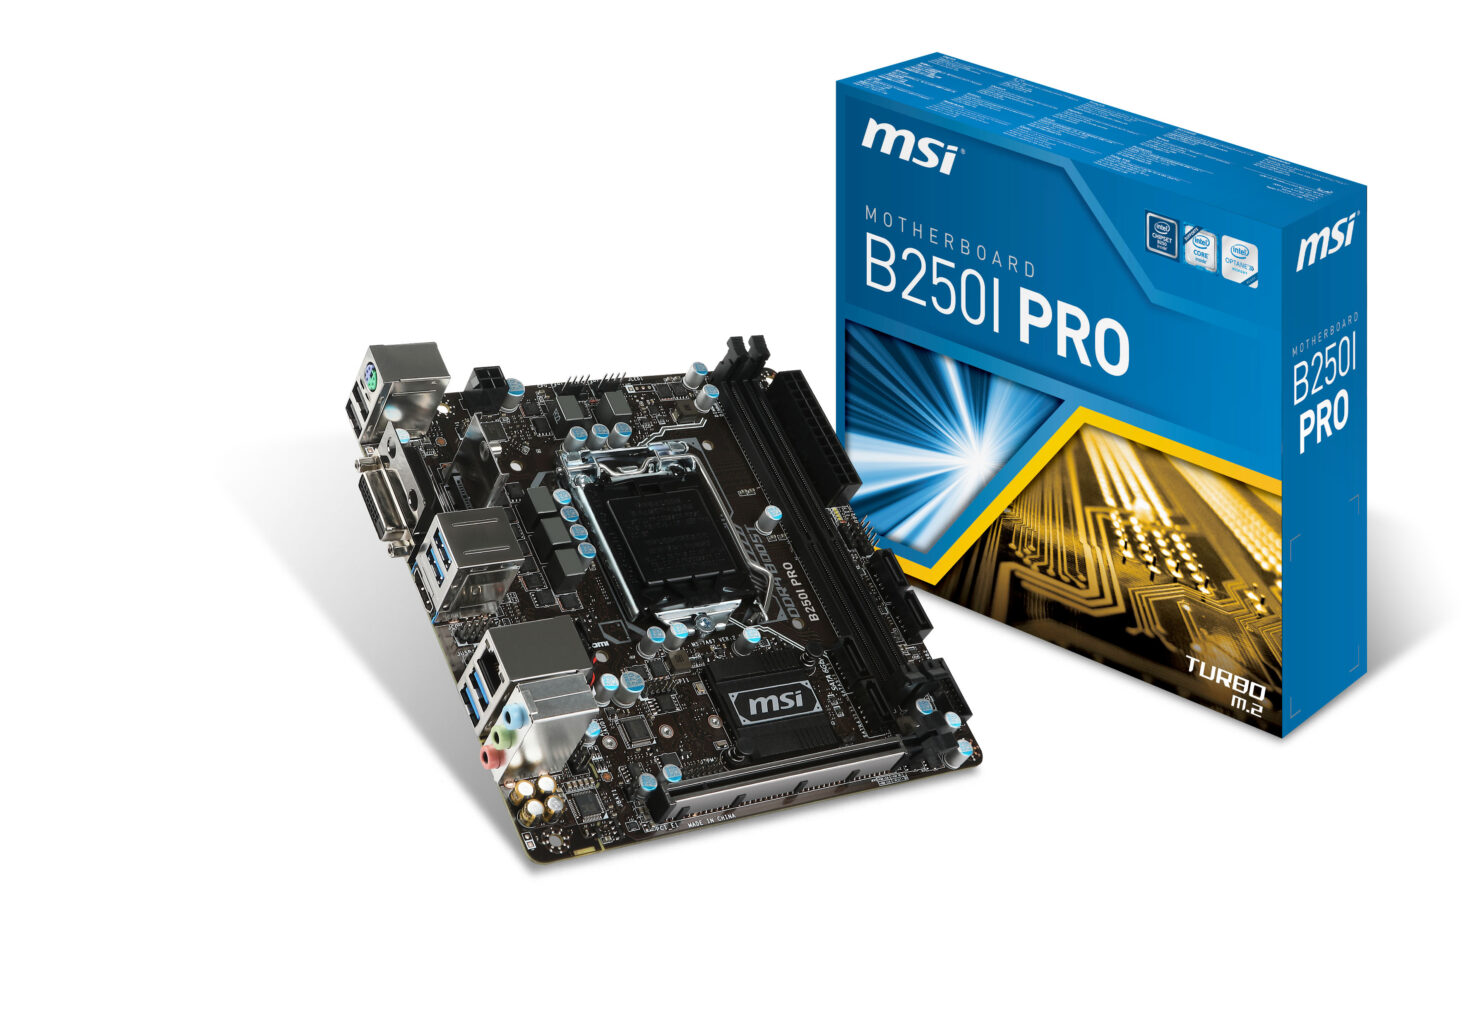 msi-b250i_pro-product_pictures-boxshot